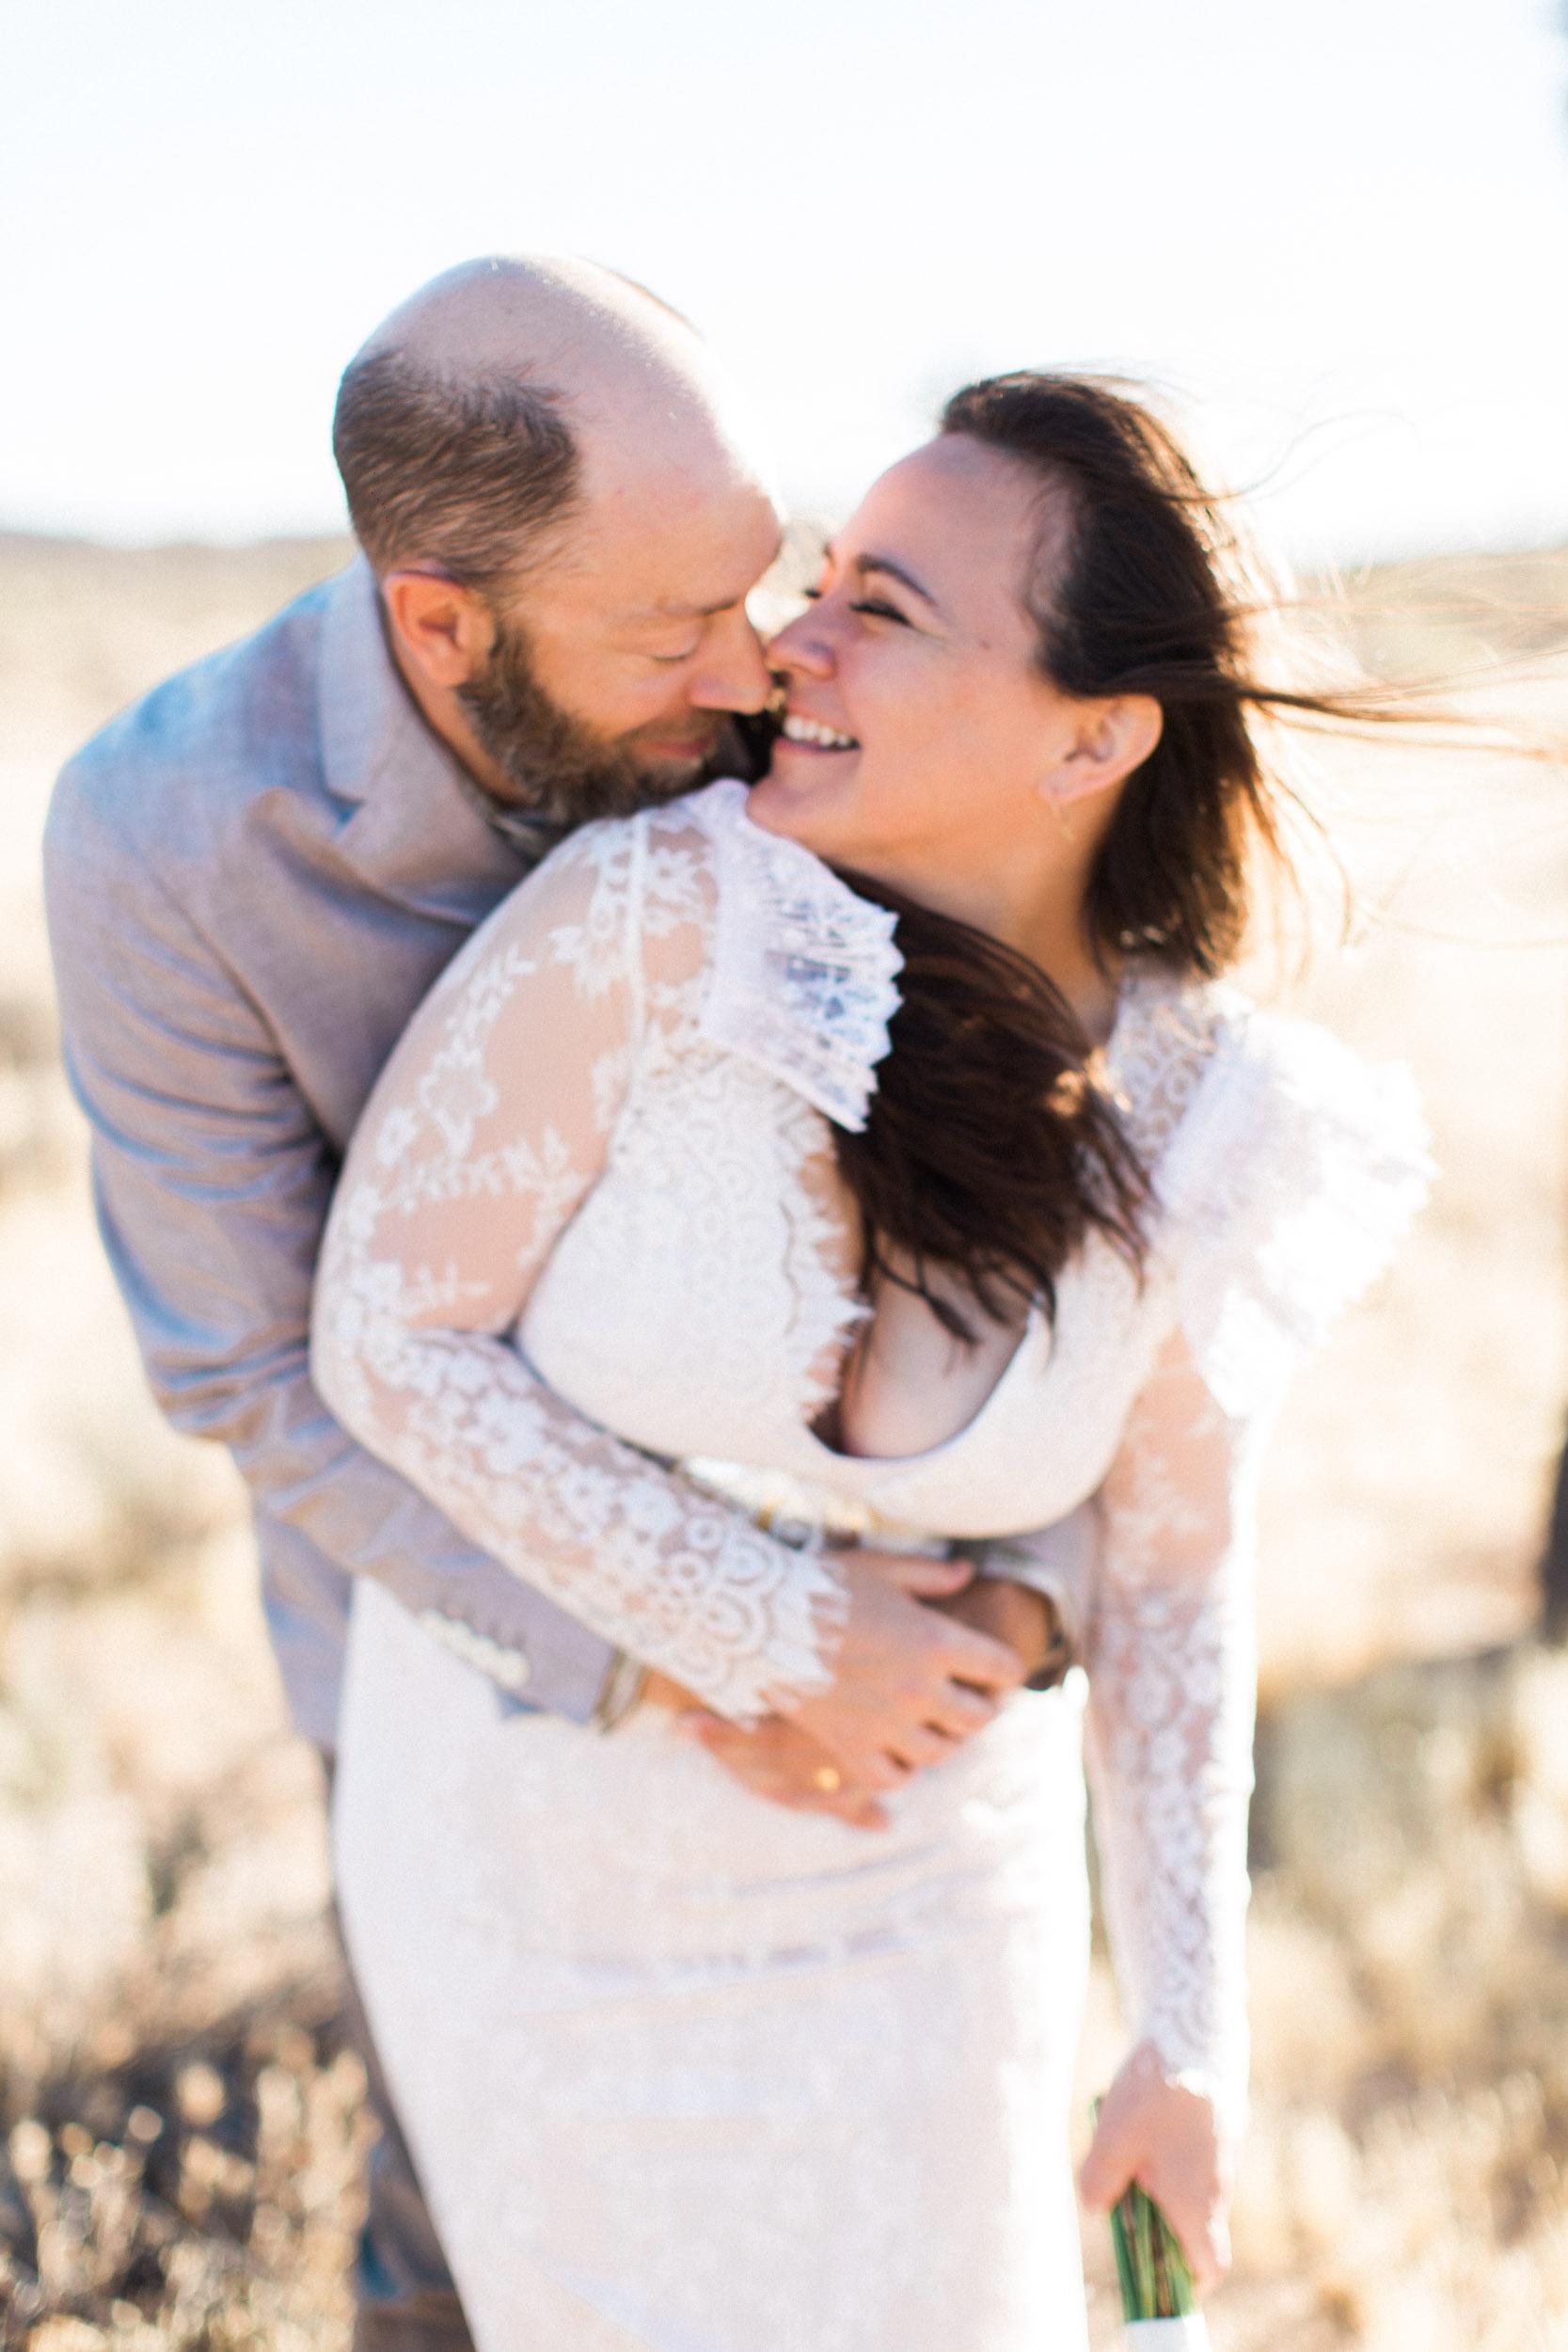 BKM-Photography-Joshua-Tree-Desert-Wedding-Elopement-0037.jpg